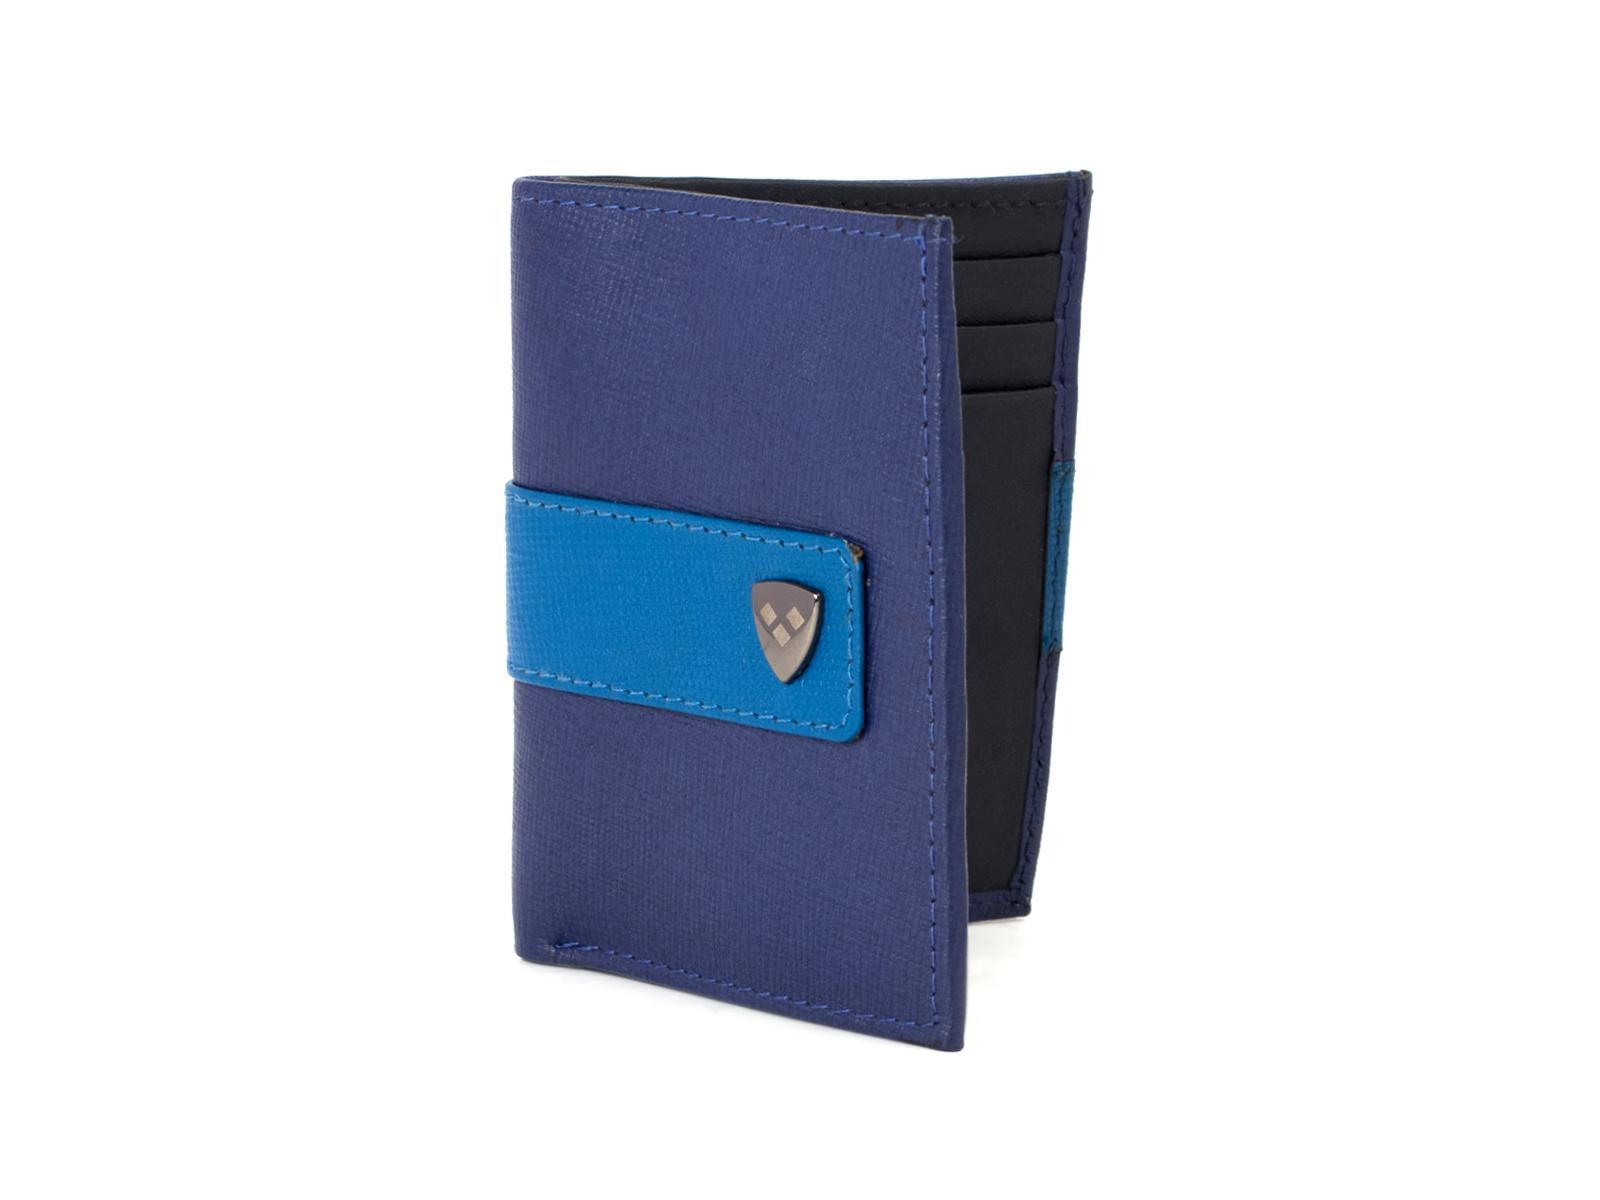 VH CH.1977-BLUE.SAFIANO Wallet